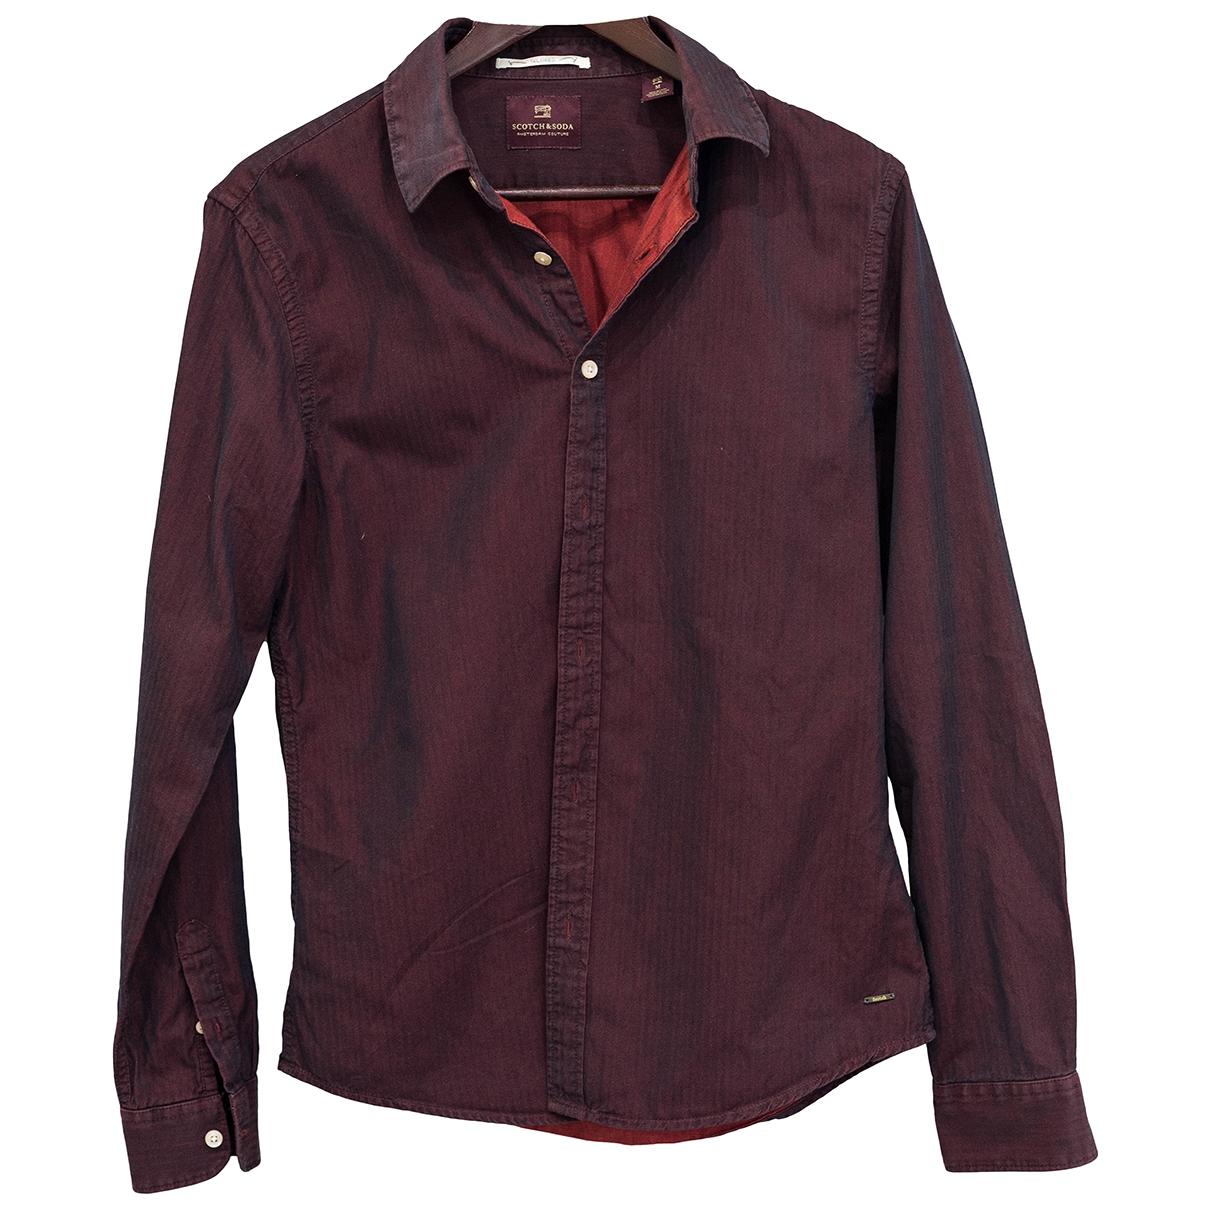 Scotch & Soda \N Burgundy Cotton Shirts for Men M International